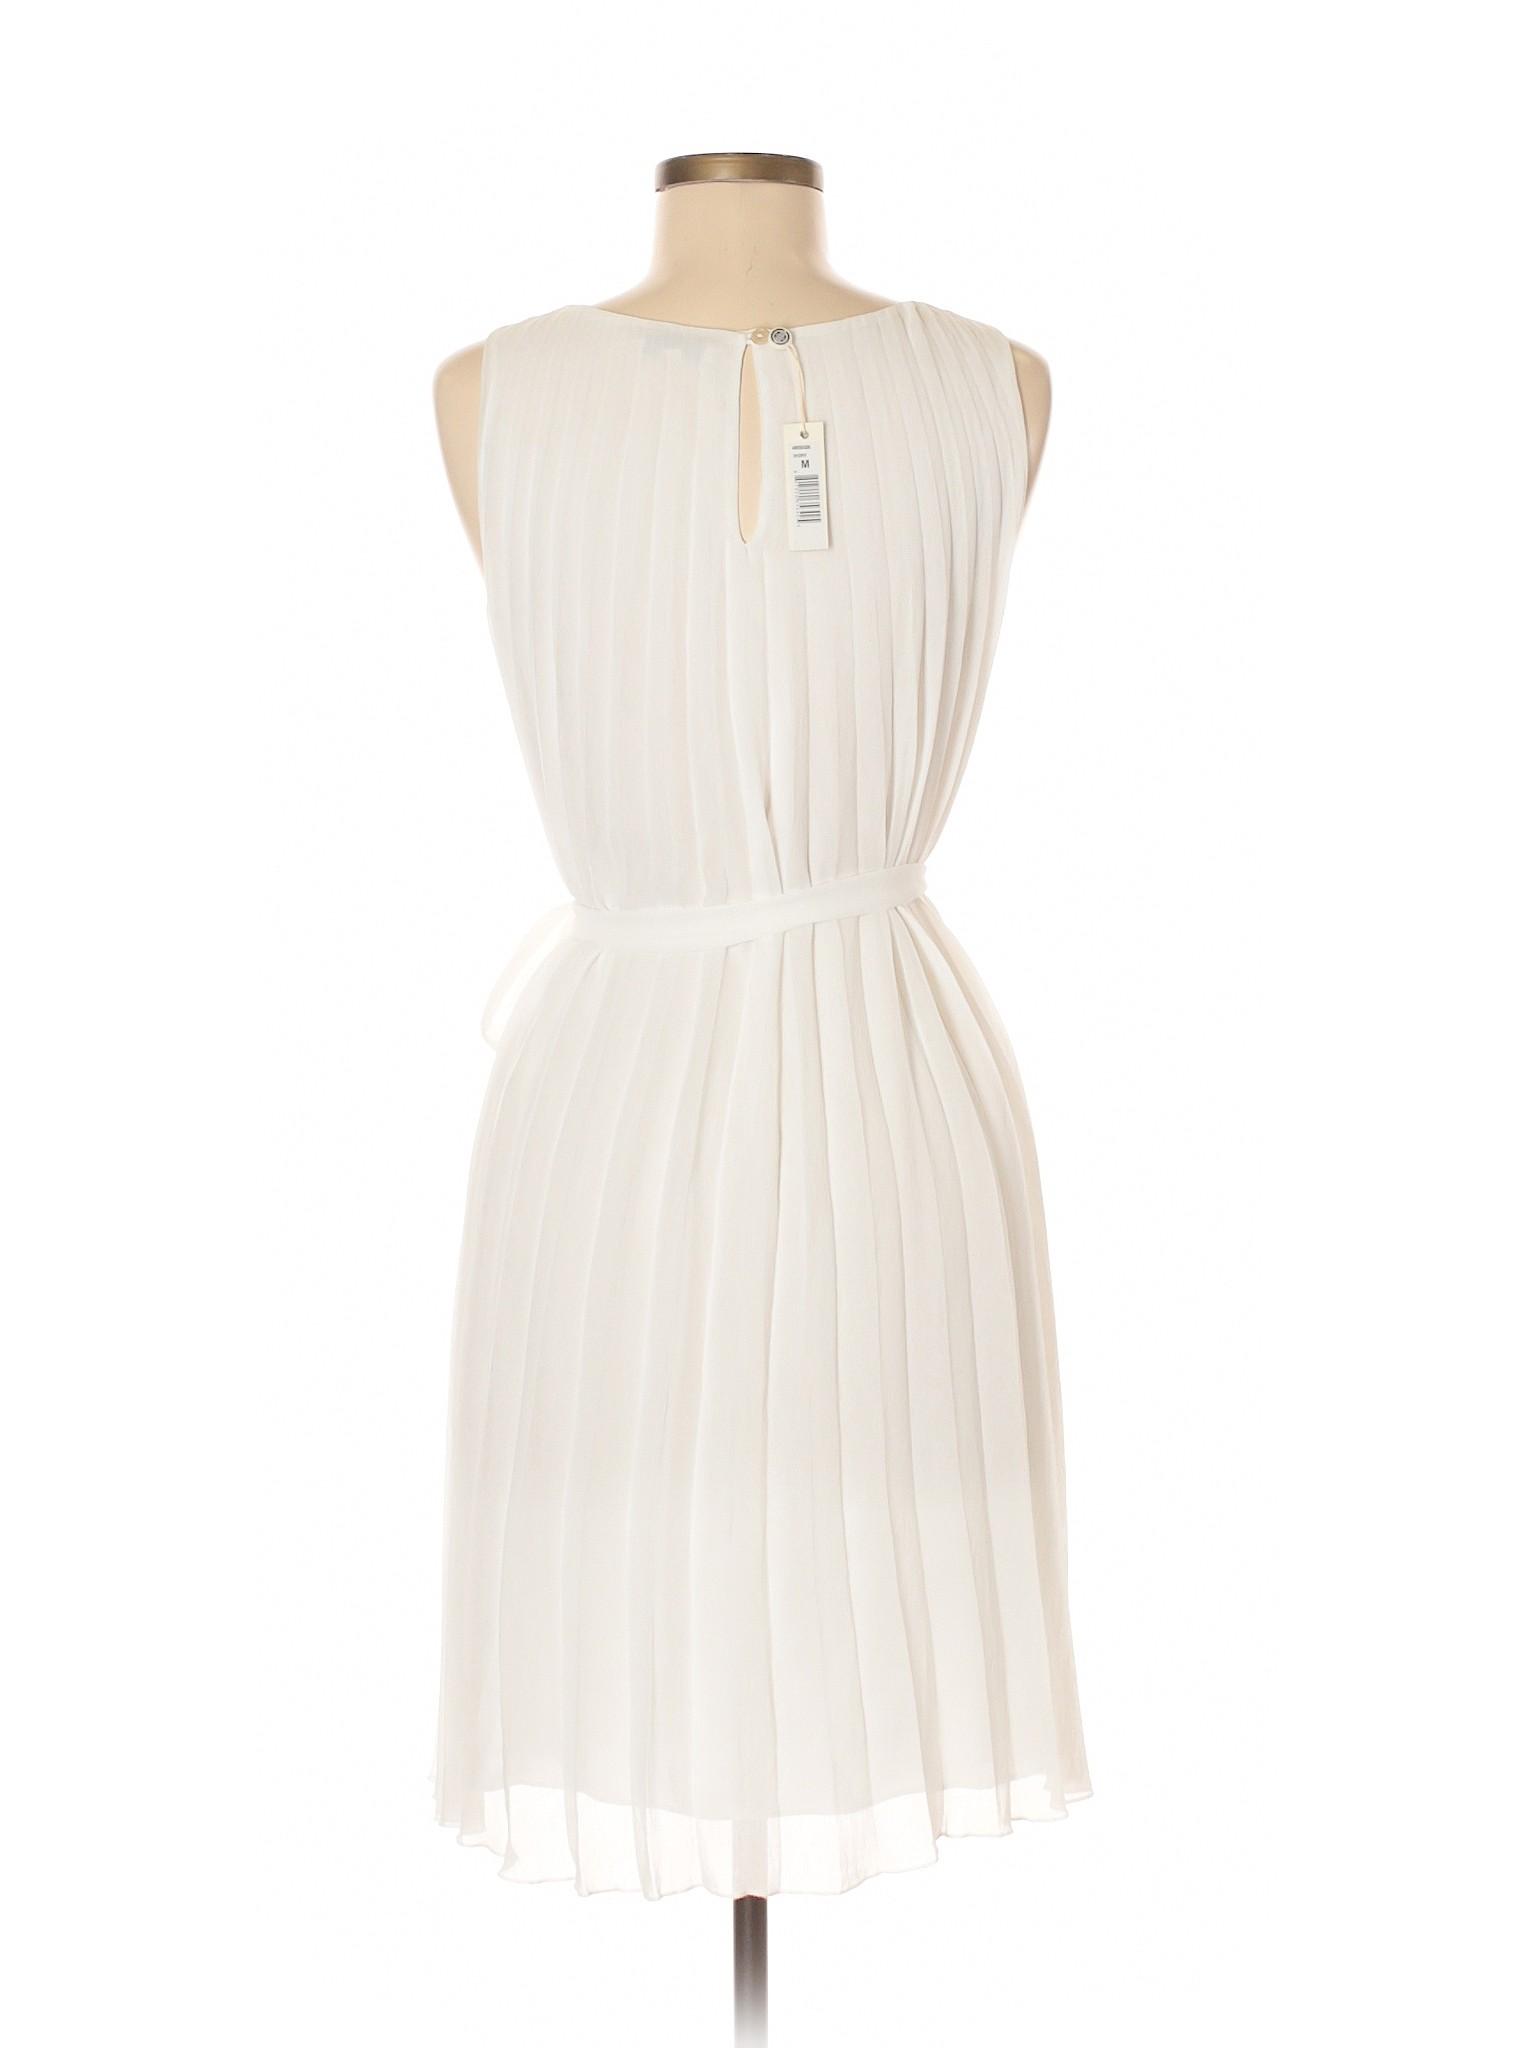 Studio Boutique winter Dress Casual Max EqXr7wE